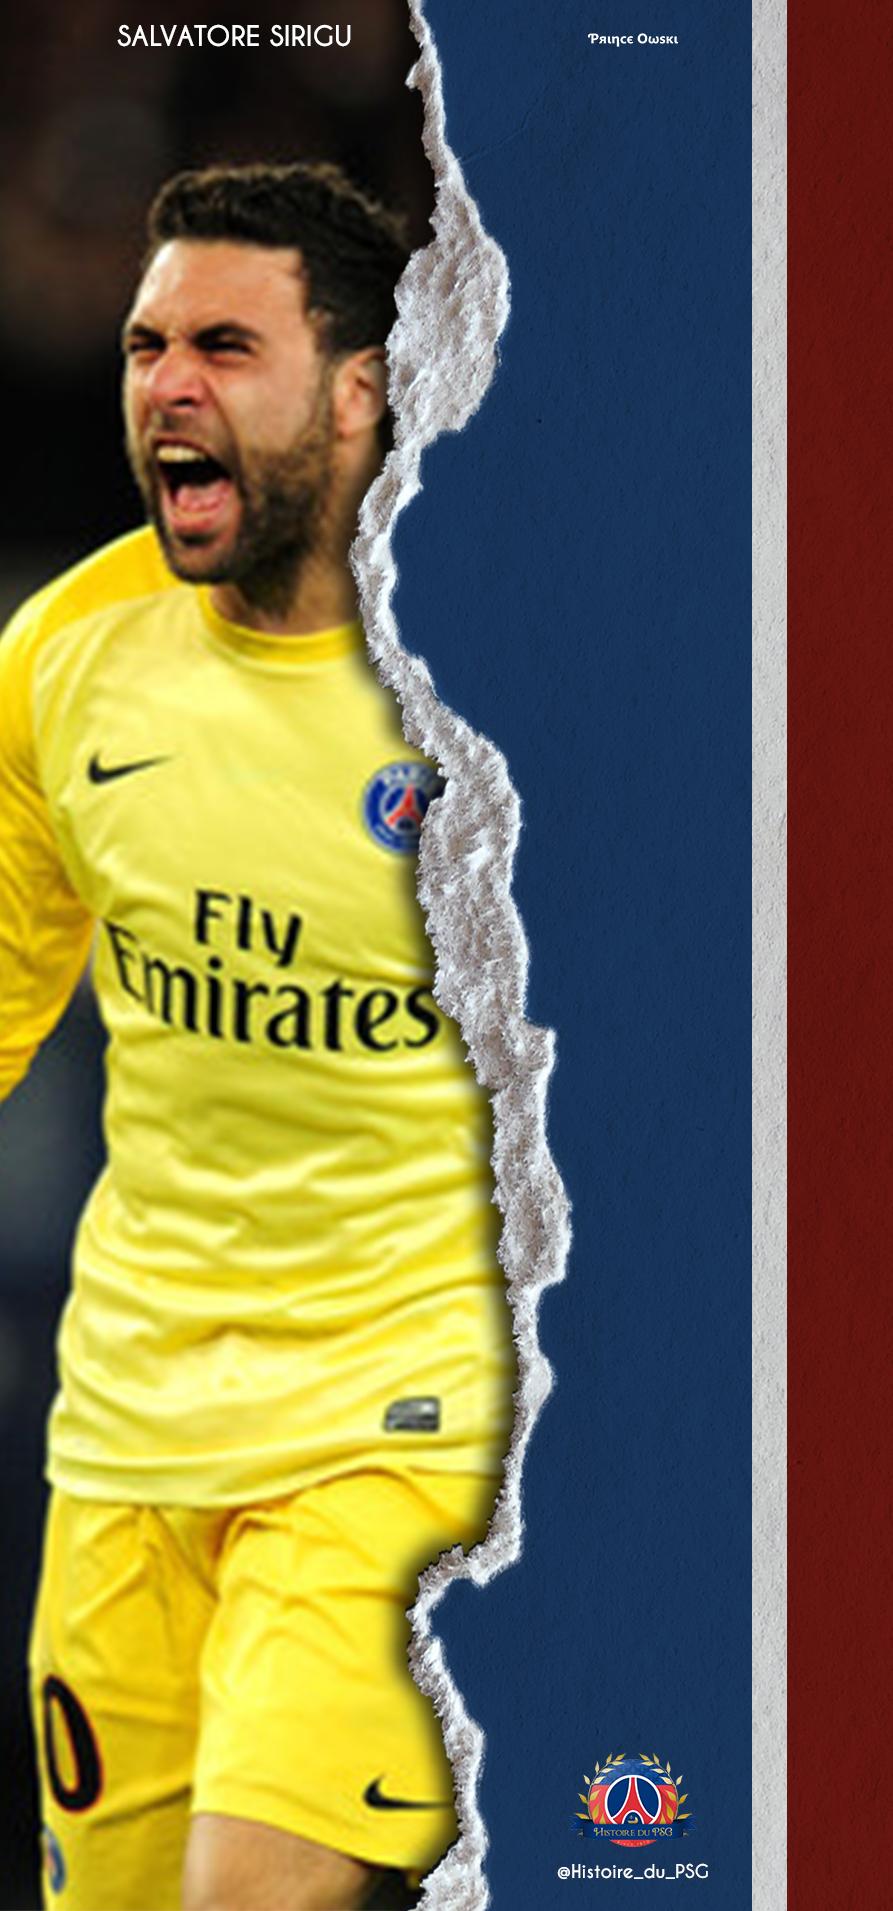 35 gardiens PSG banniere instagram tel - sirigu v2